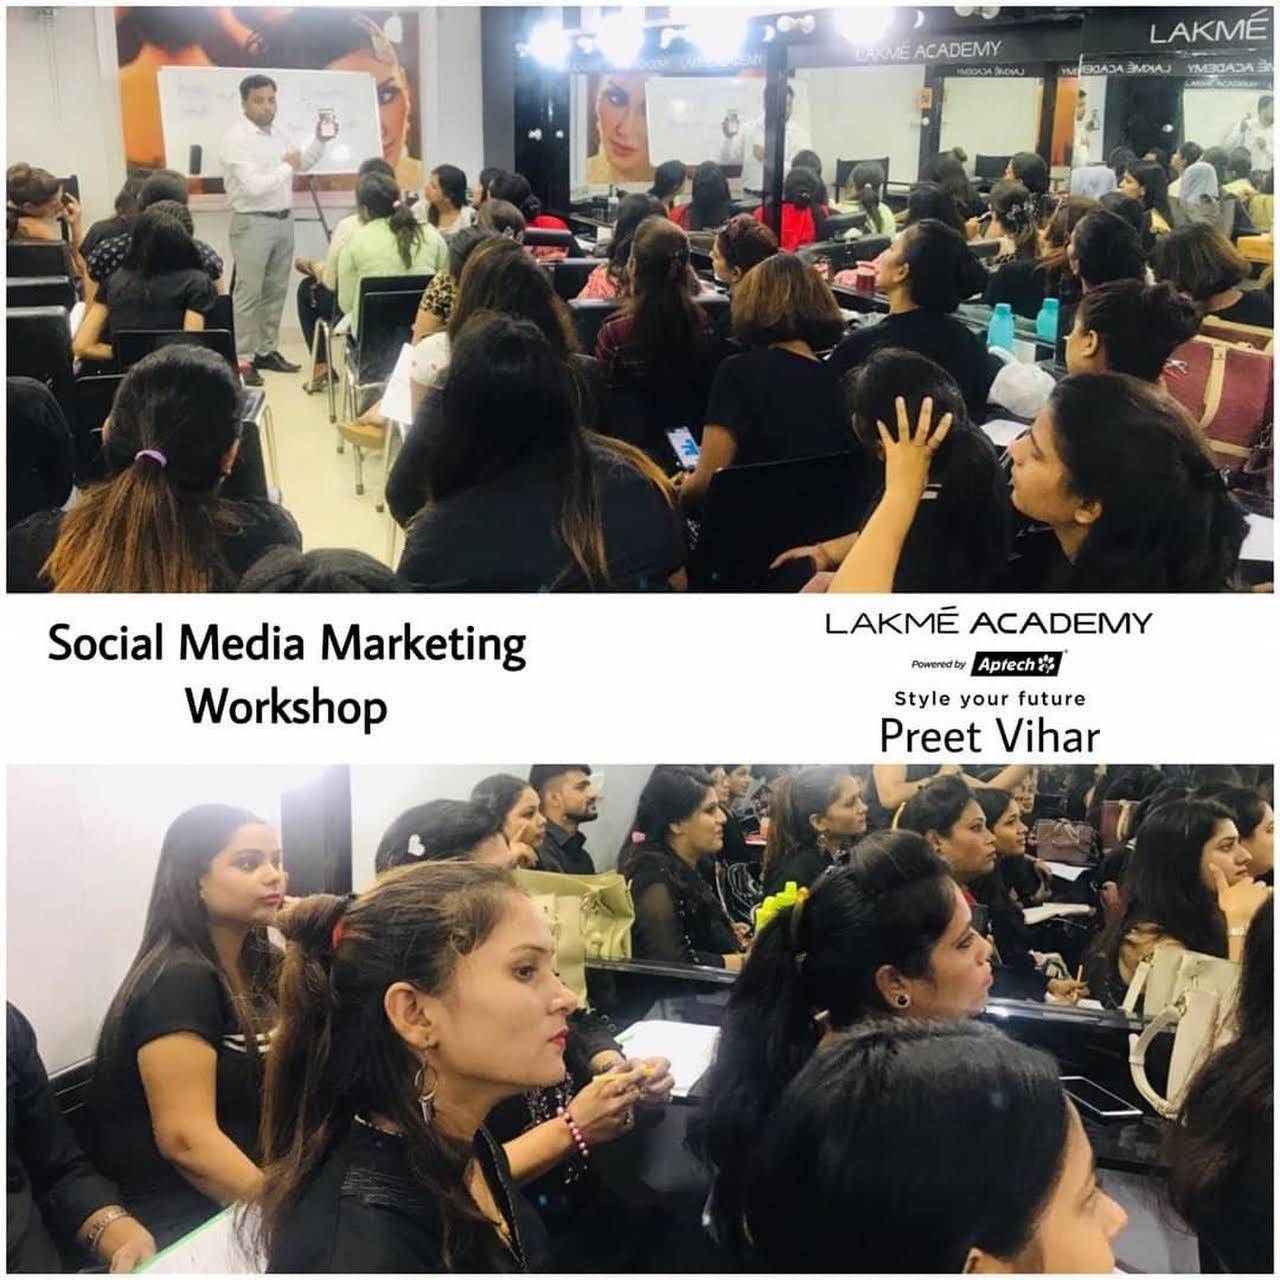 Lakme Academy Preet Vihar - Makeup Artist Training center